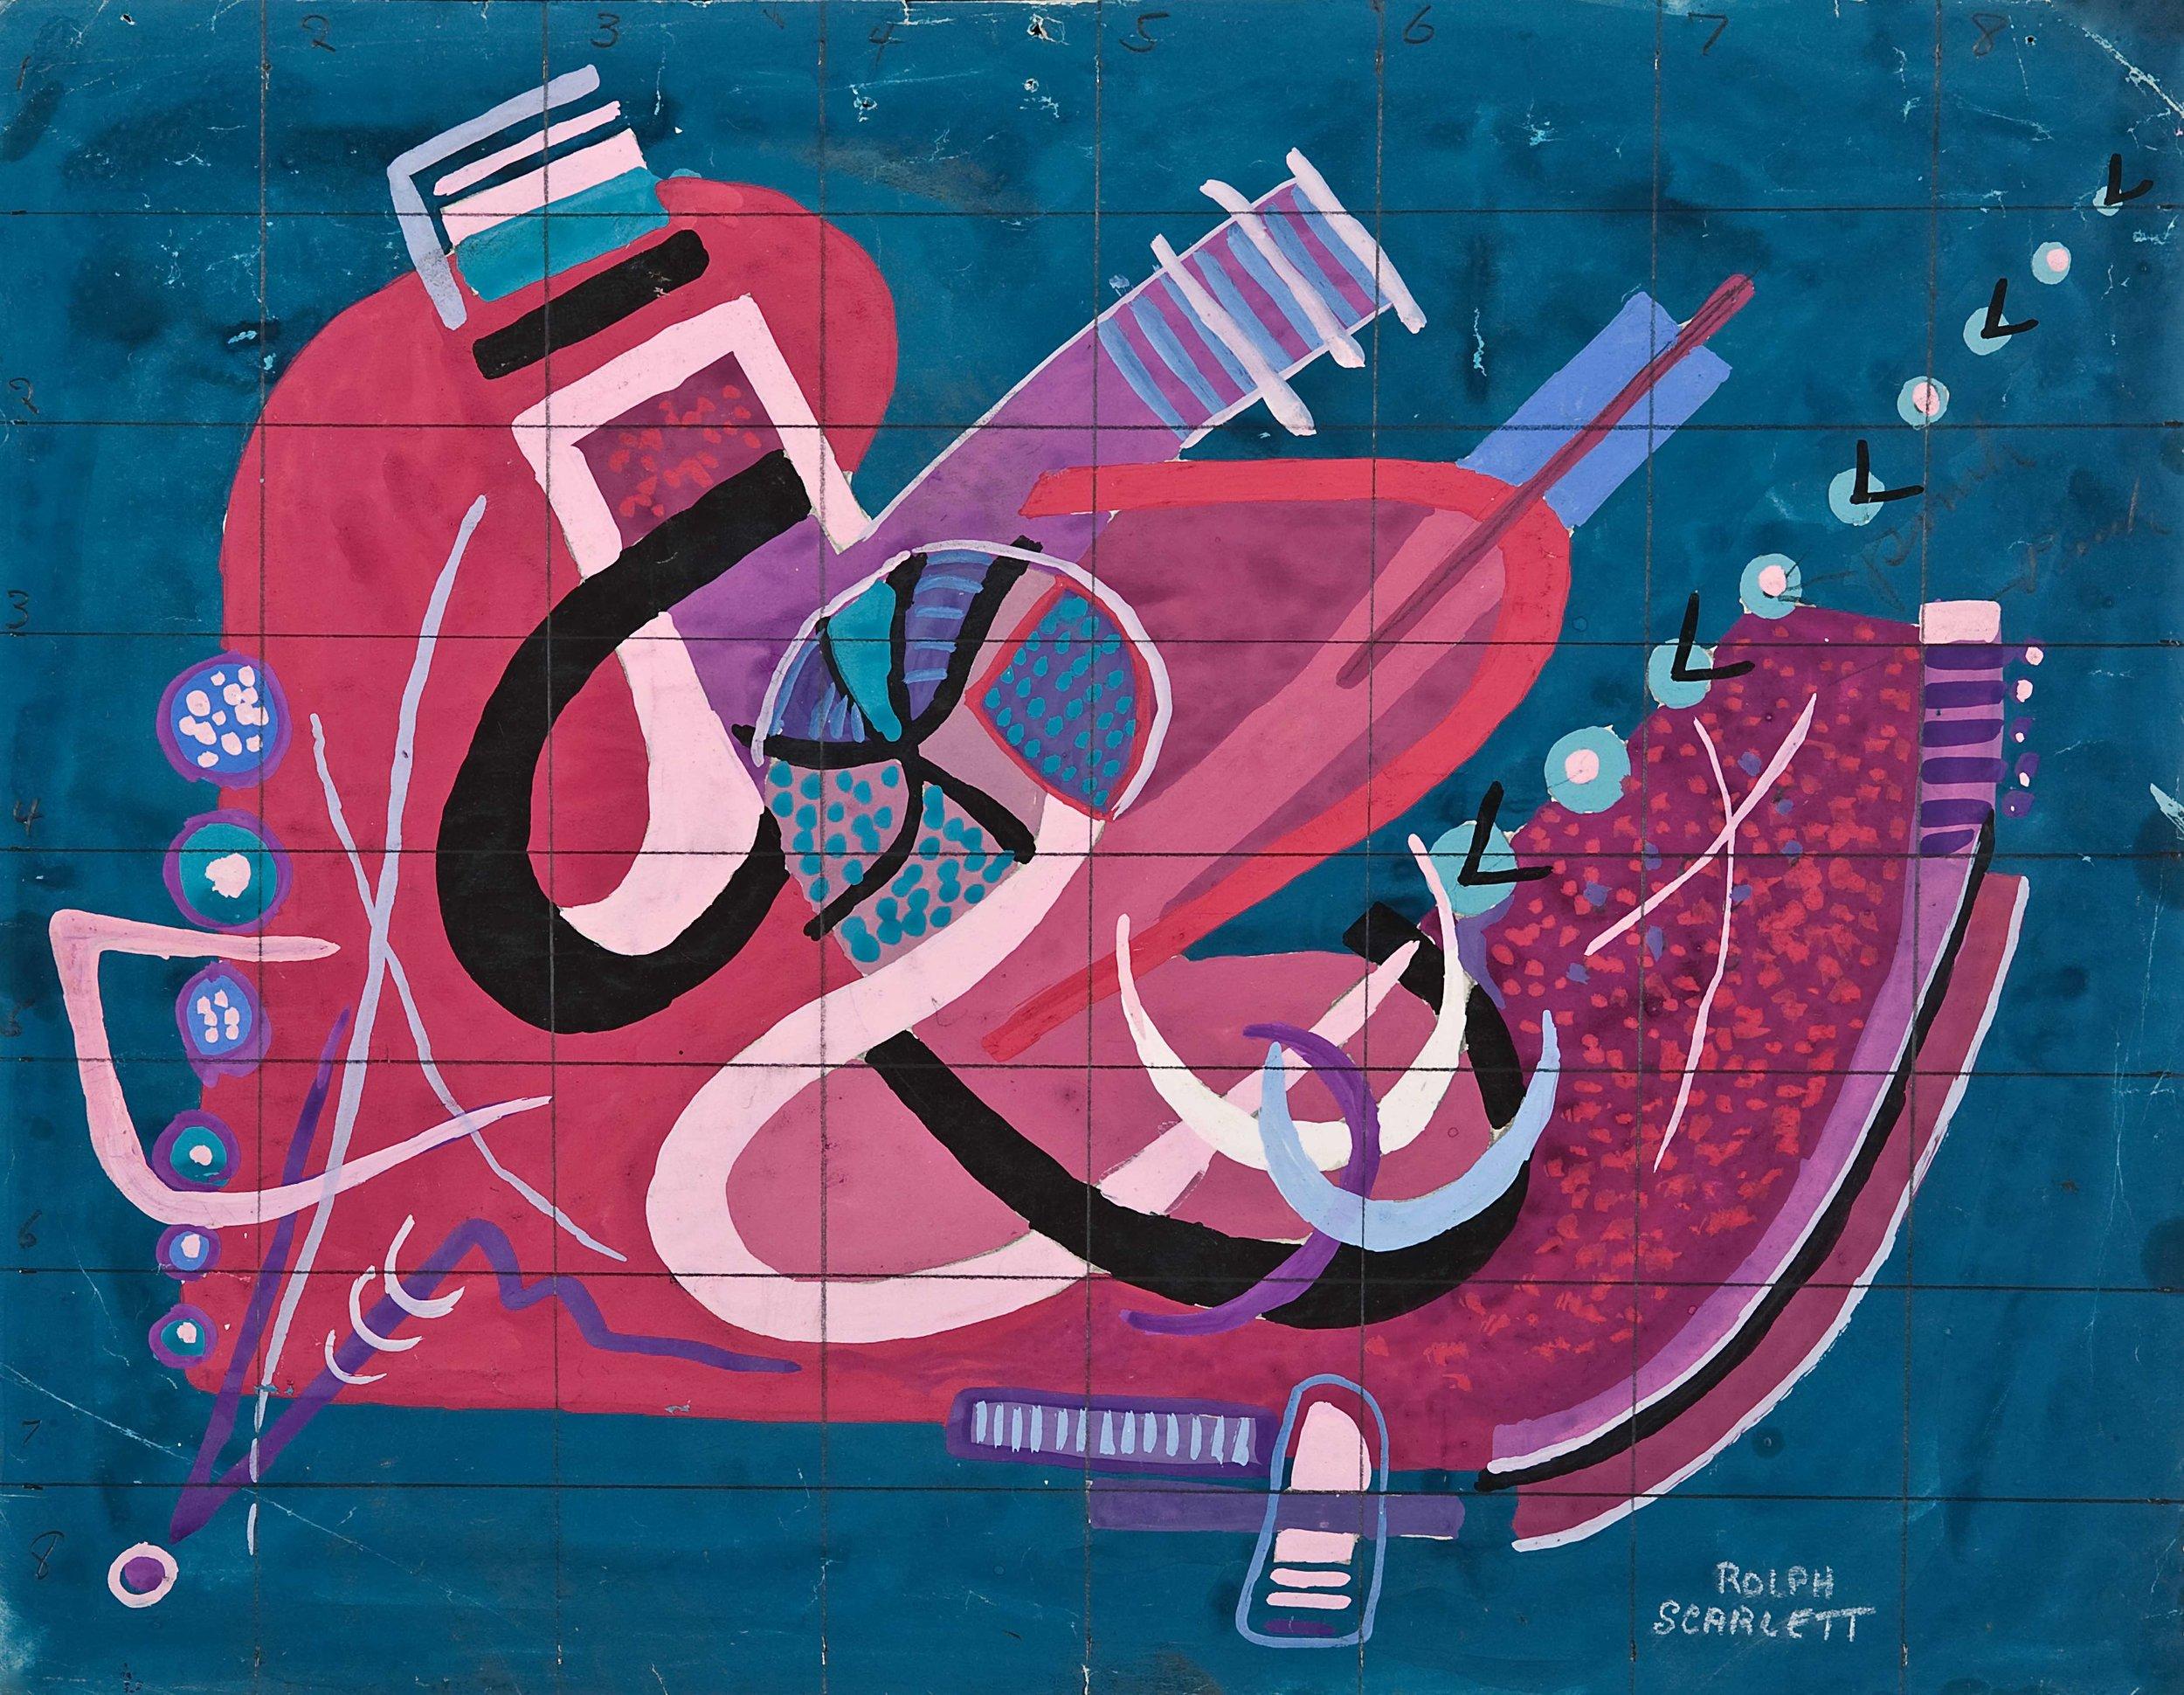 "Rolph Scarlett, (RS170),  c. 1944,graphite and gouache on paper, 18 1/2 x 20 3/8"" framed"